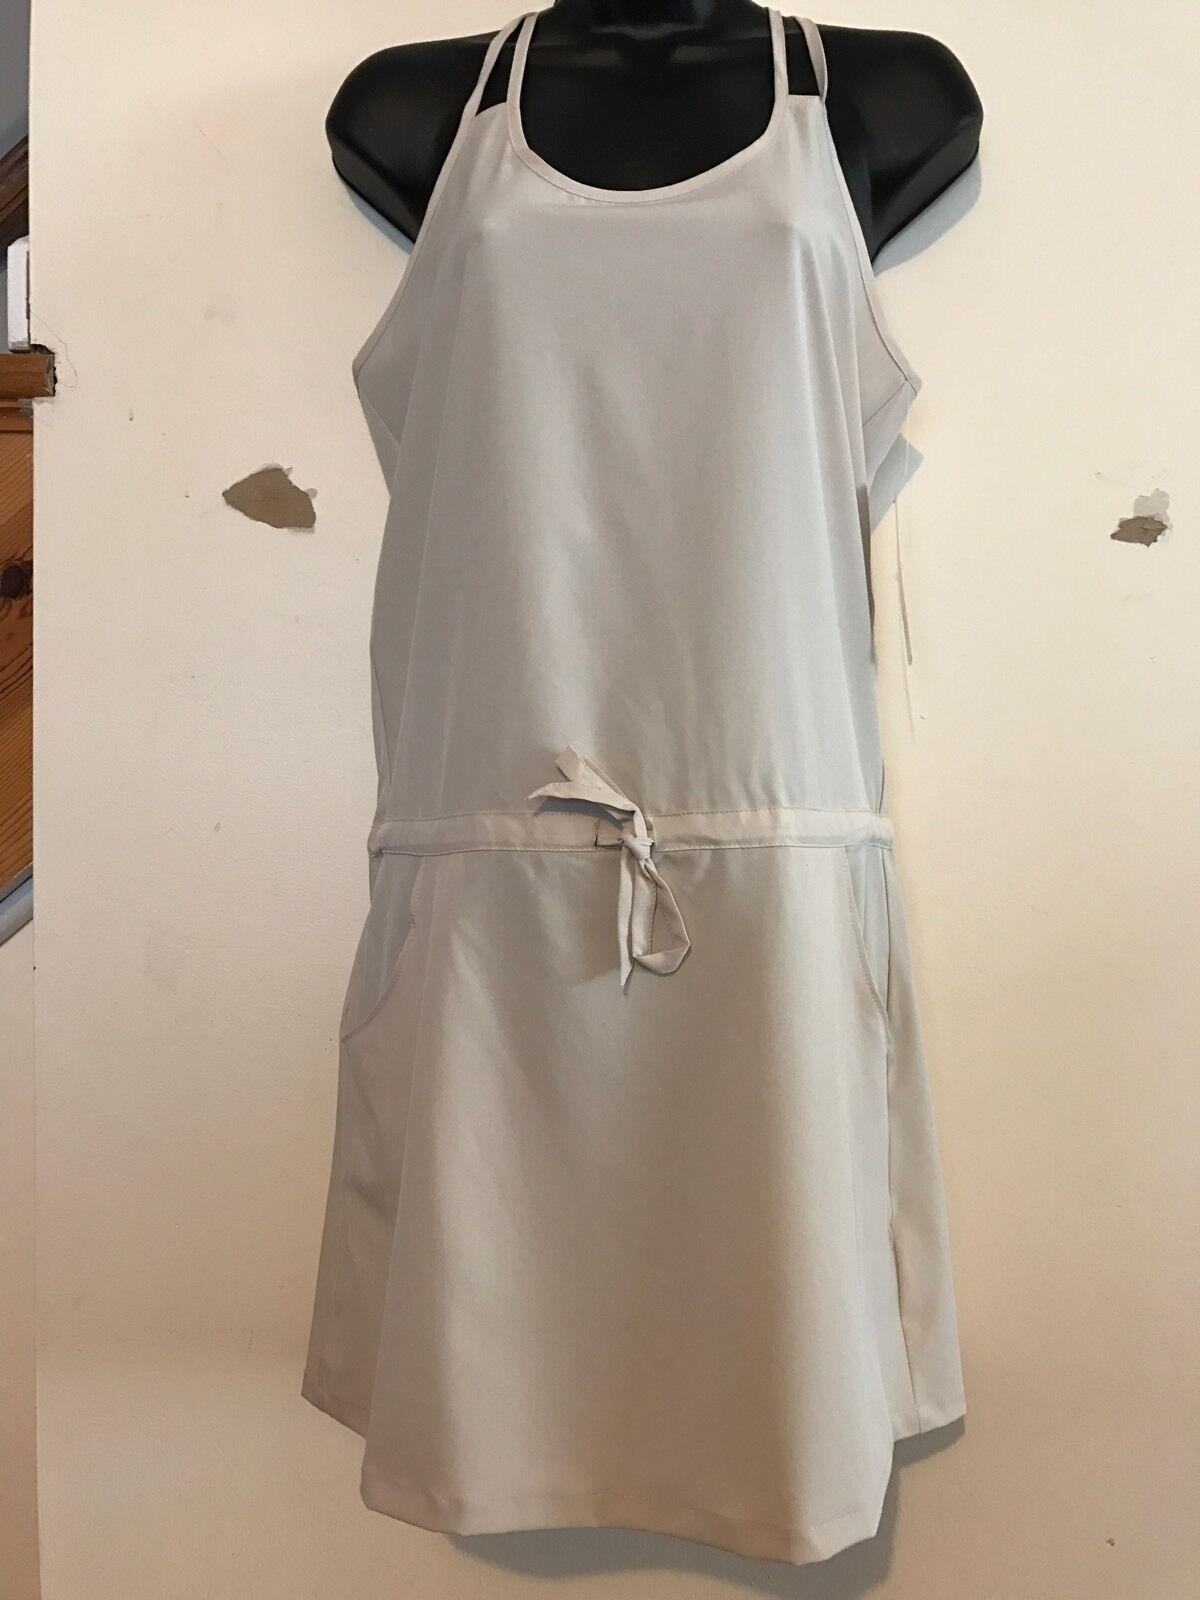 Apana Yoga Wear Women's Dress Moisture-wicking Sandshell Freeshipping NWT